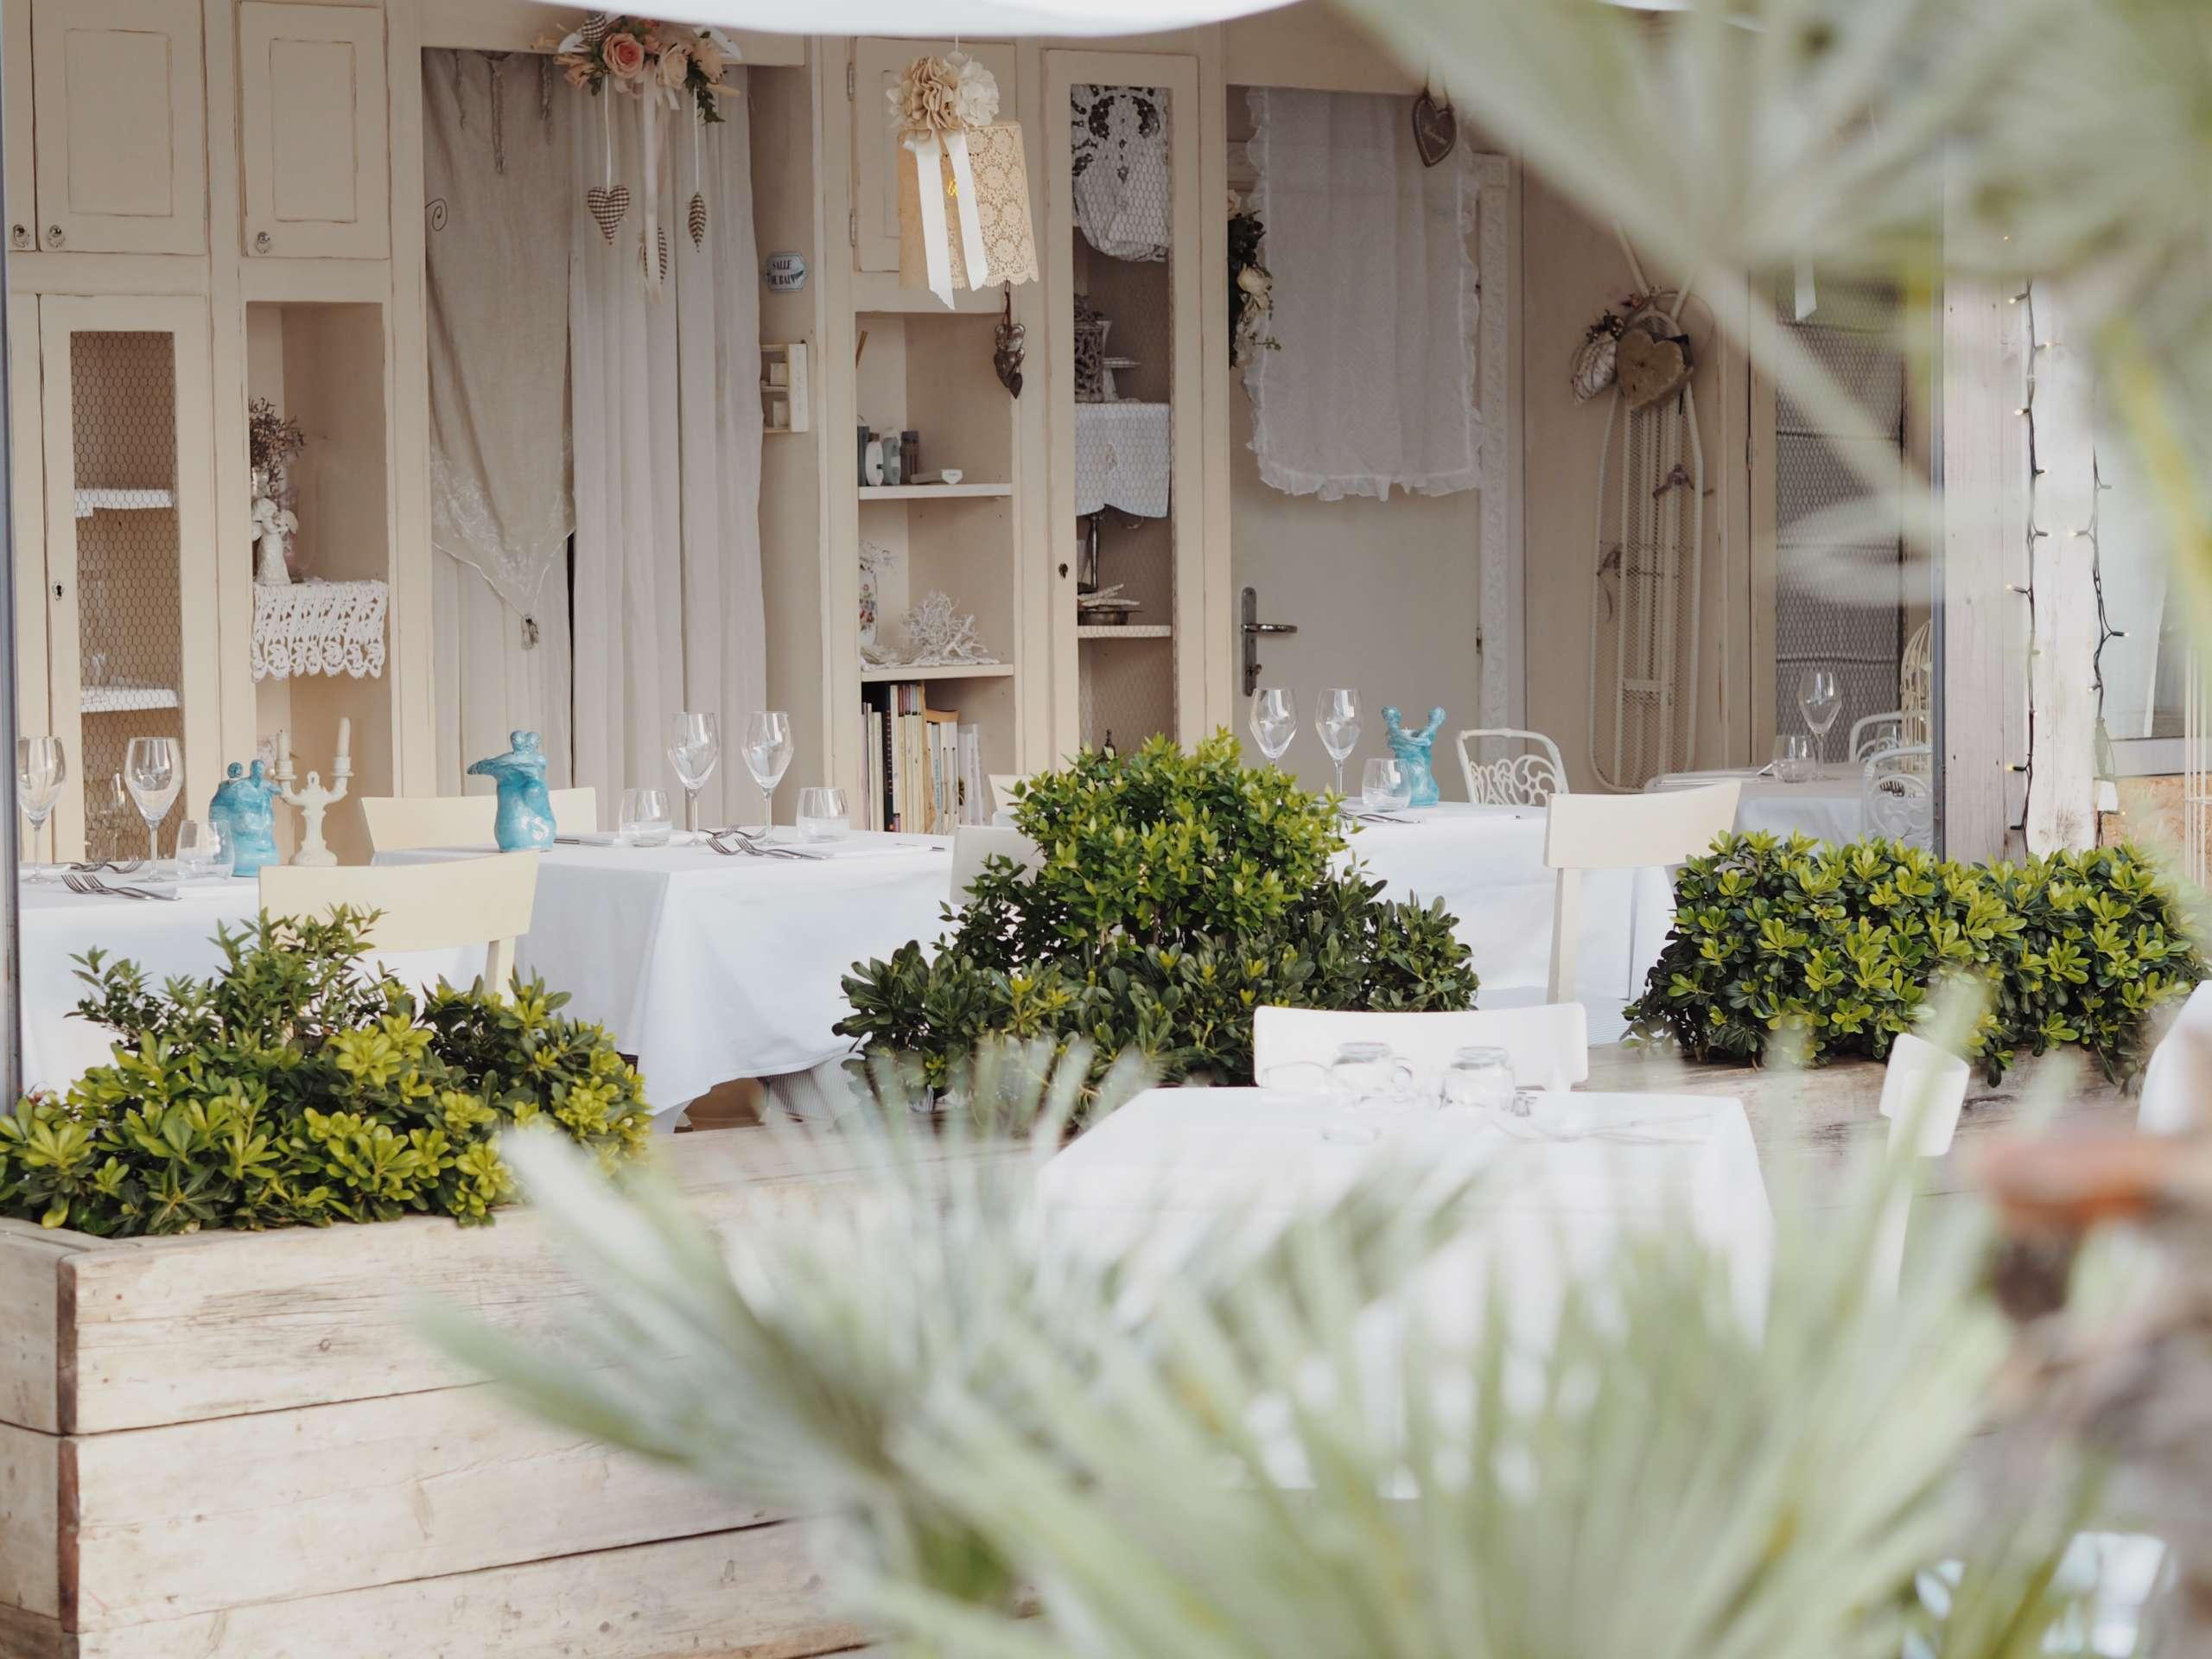 sol-y-mar-riccione-beach-Eksept-Italy-otterbox-phone-case-summer-gucci-won hundred